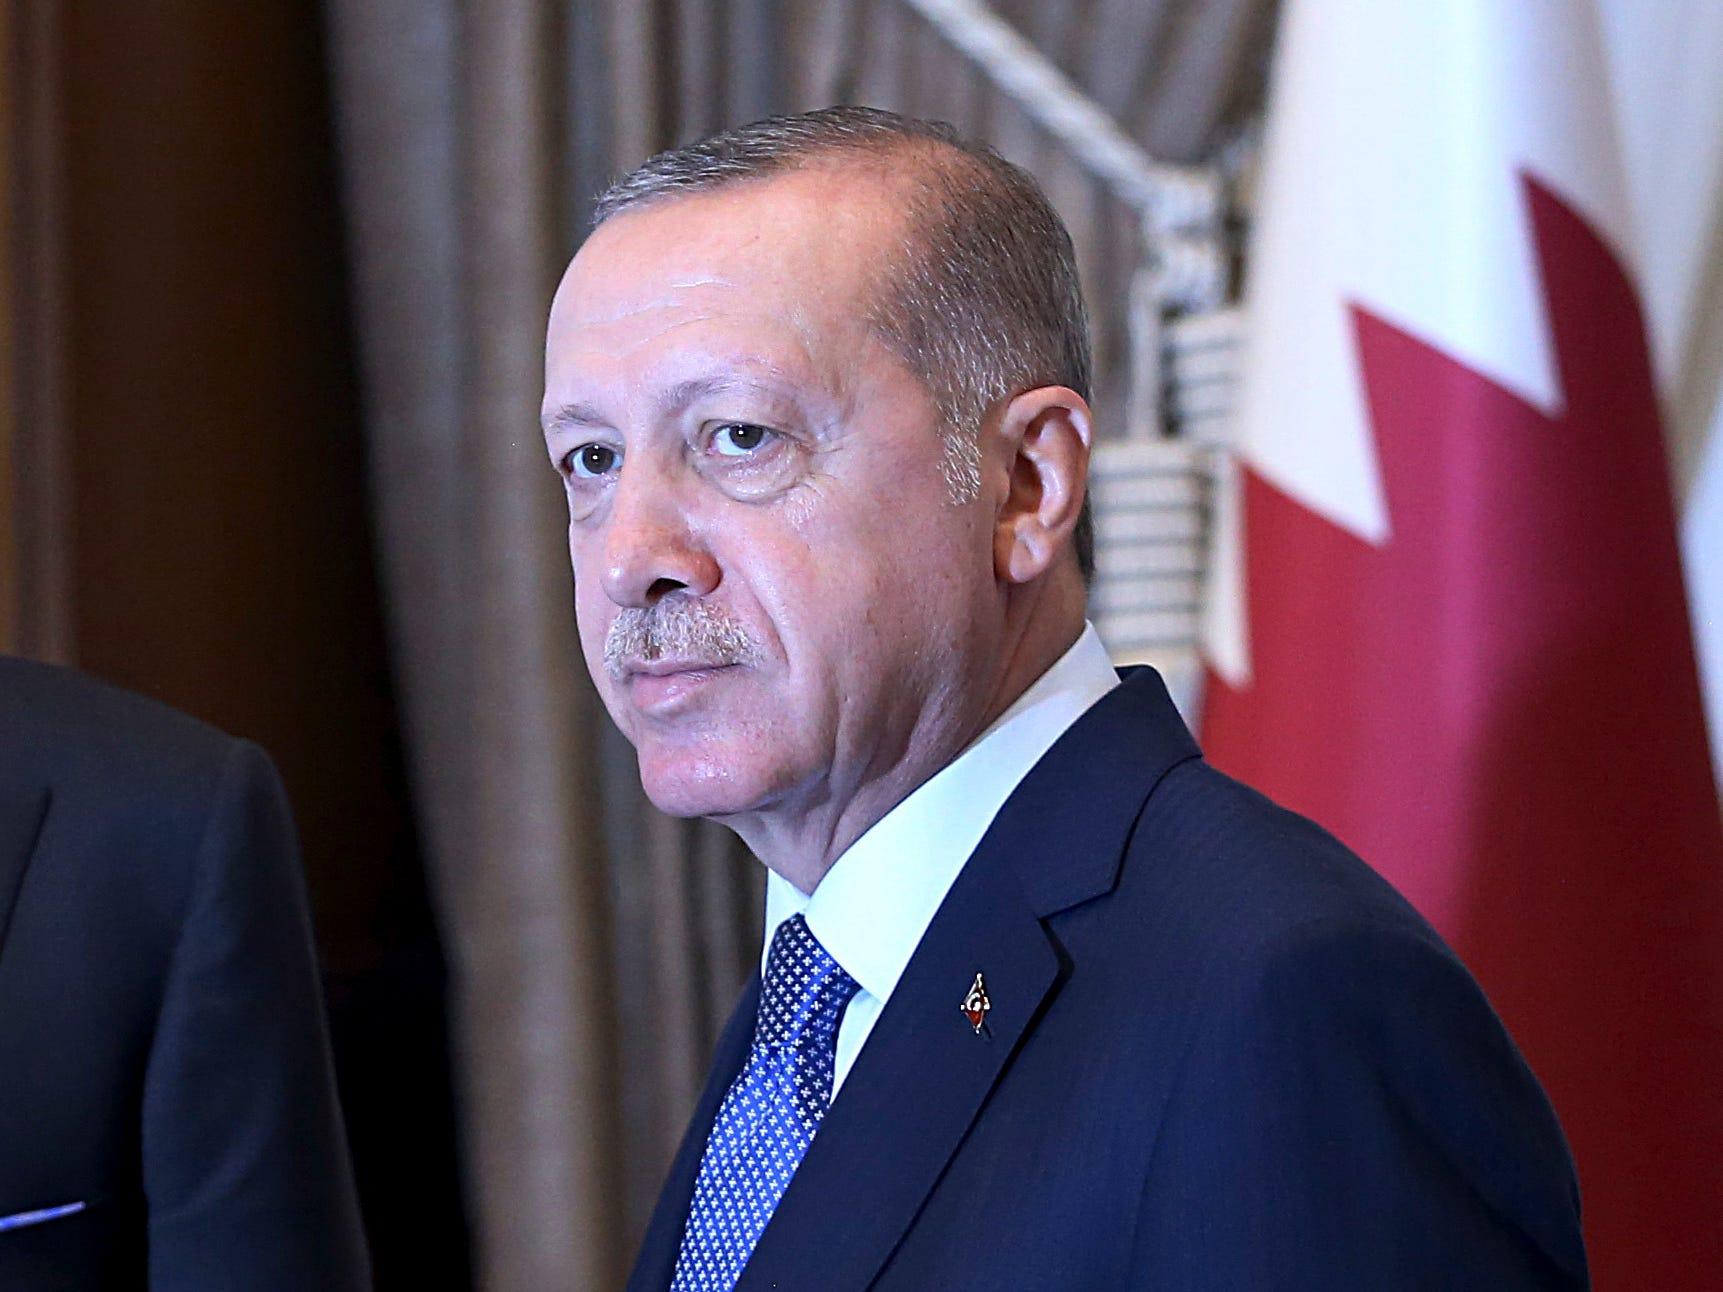 Turkey's President Recep Tayyip Erdogan, meets Qatar's Emir Sheikh Tamim bin Hamad Al Thani prior to their talks at the Presidential Palace in Ankara, Turkey, Aug. 15, 2018.